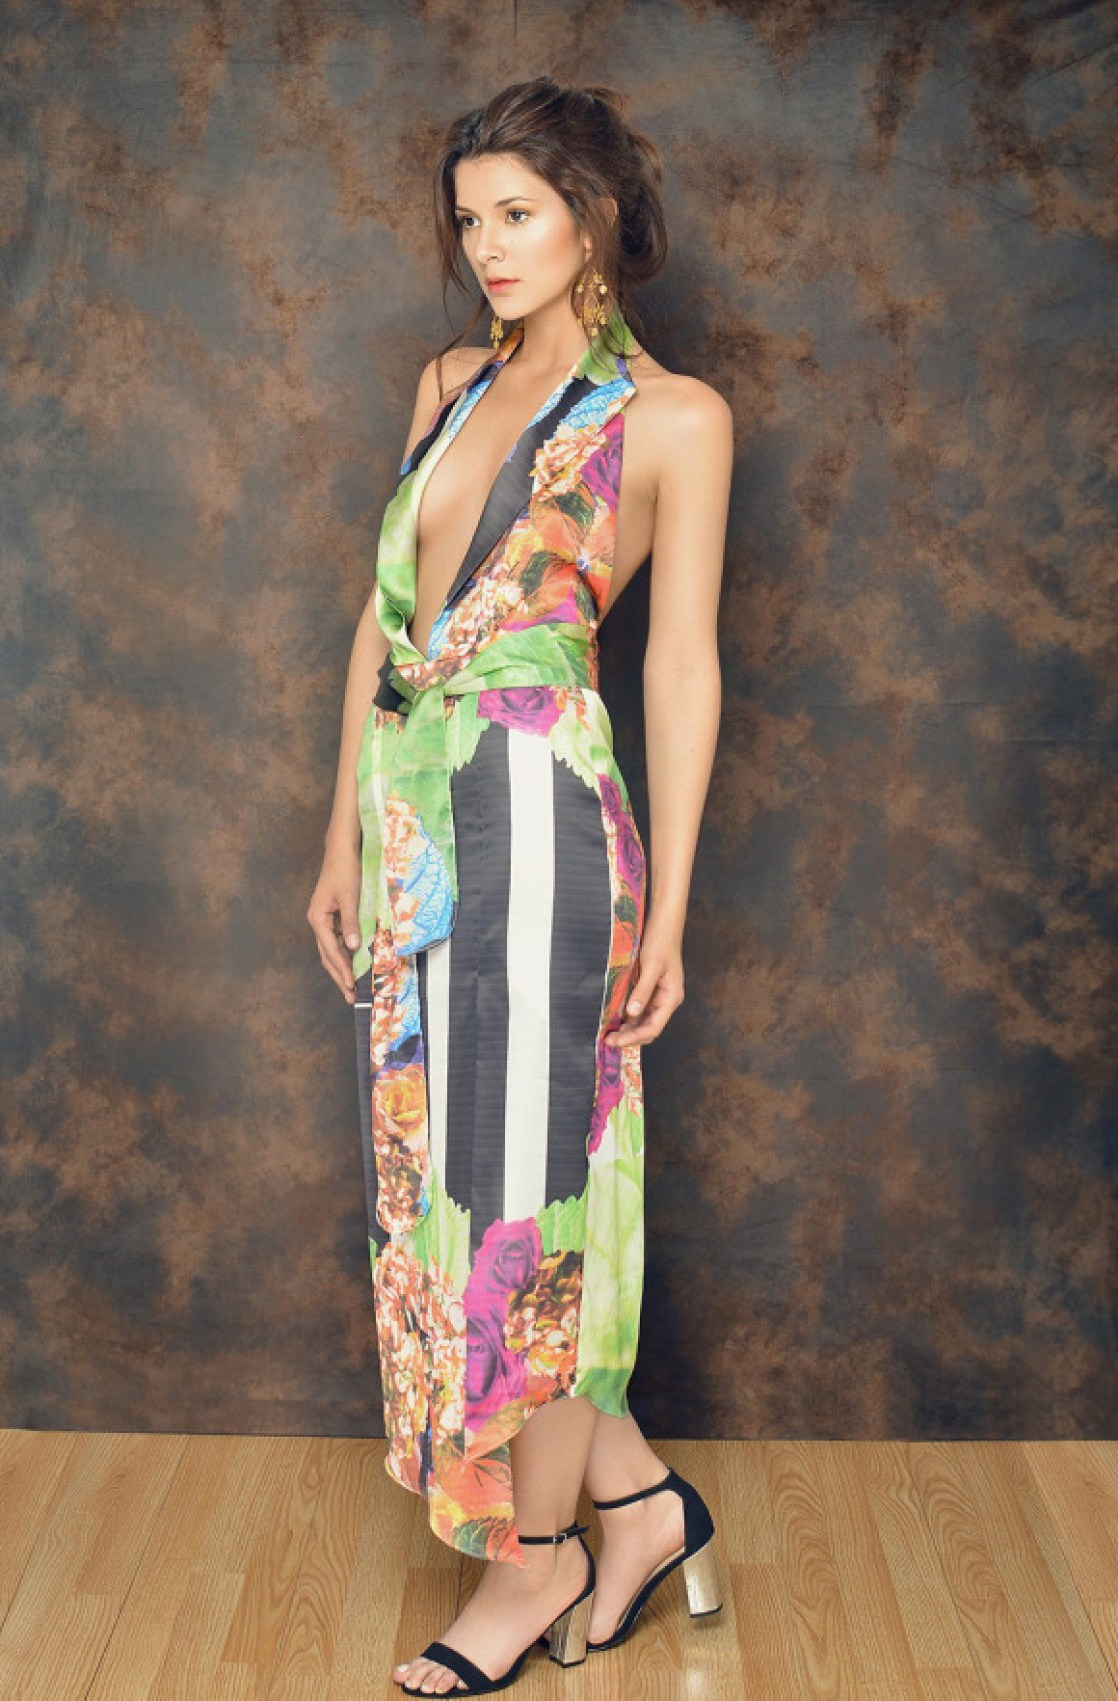 19-fashion-campaign-kwmariakarina-danielastyling-fashion-editorials-styling-stylist-fashion-blog-3